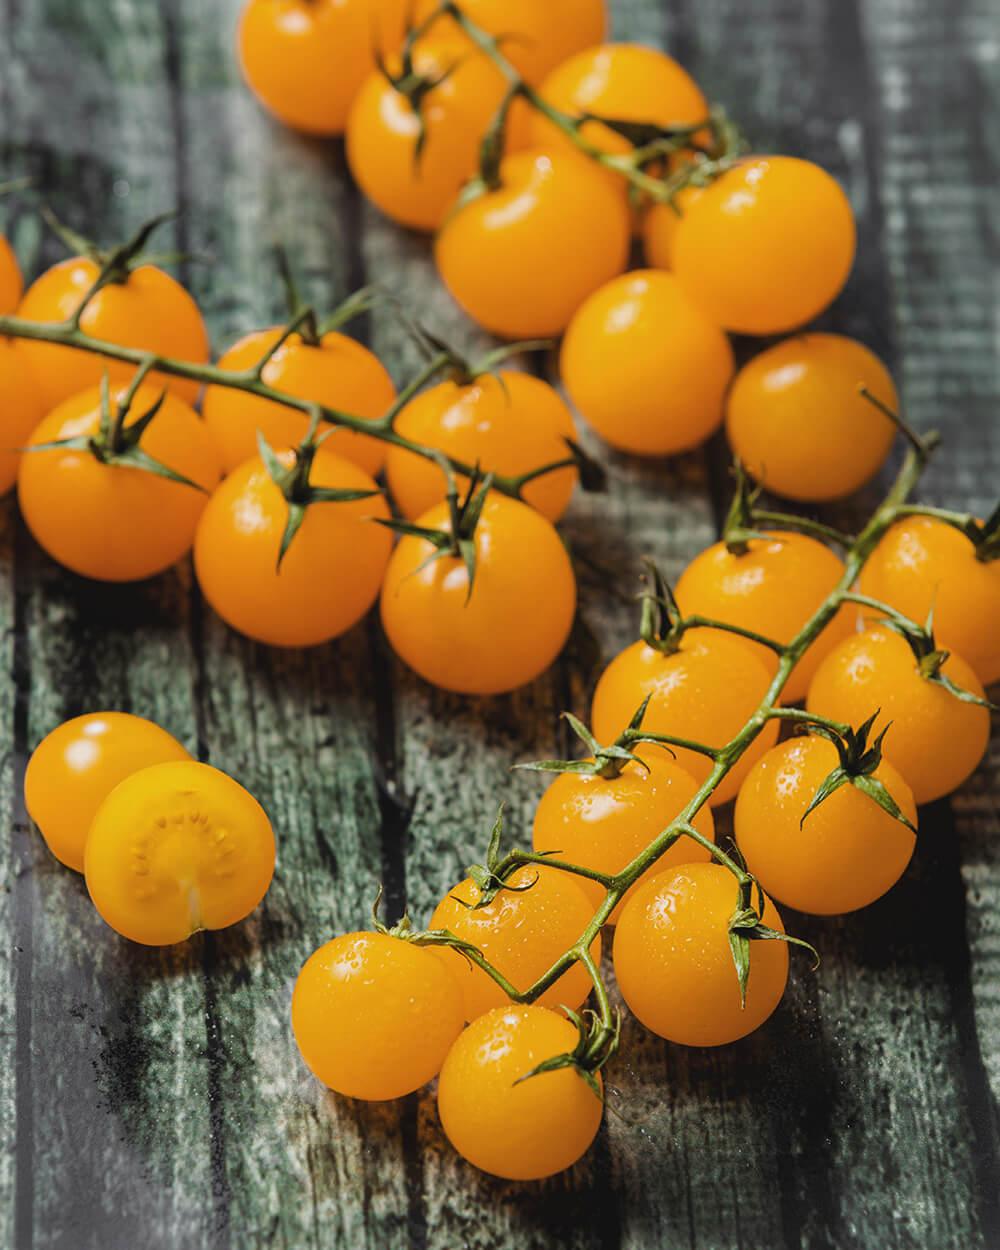 Yellow Tomatoes Netherlands